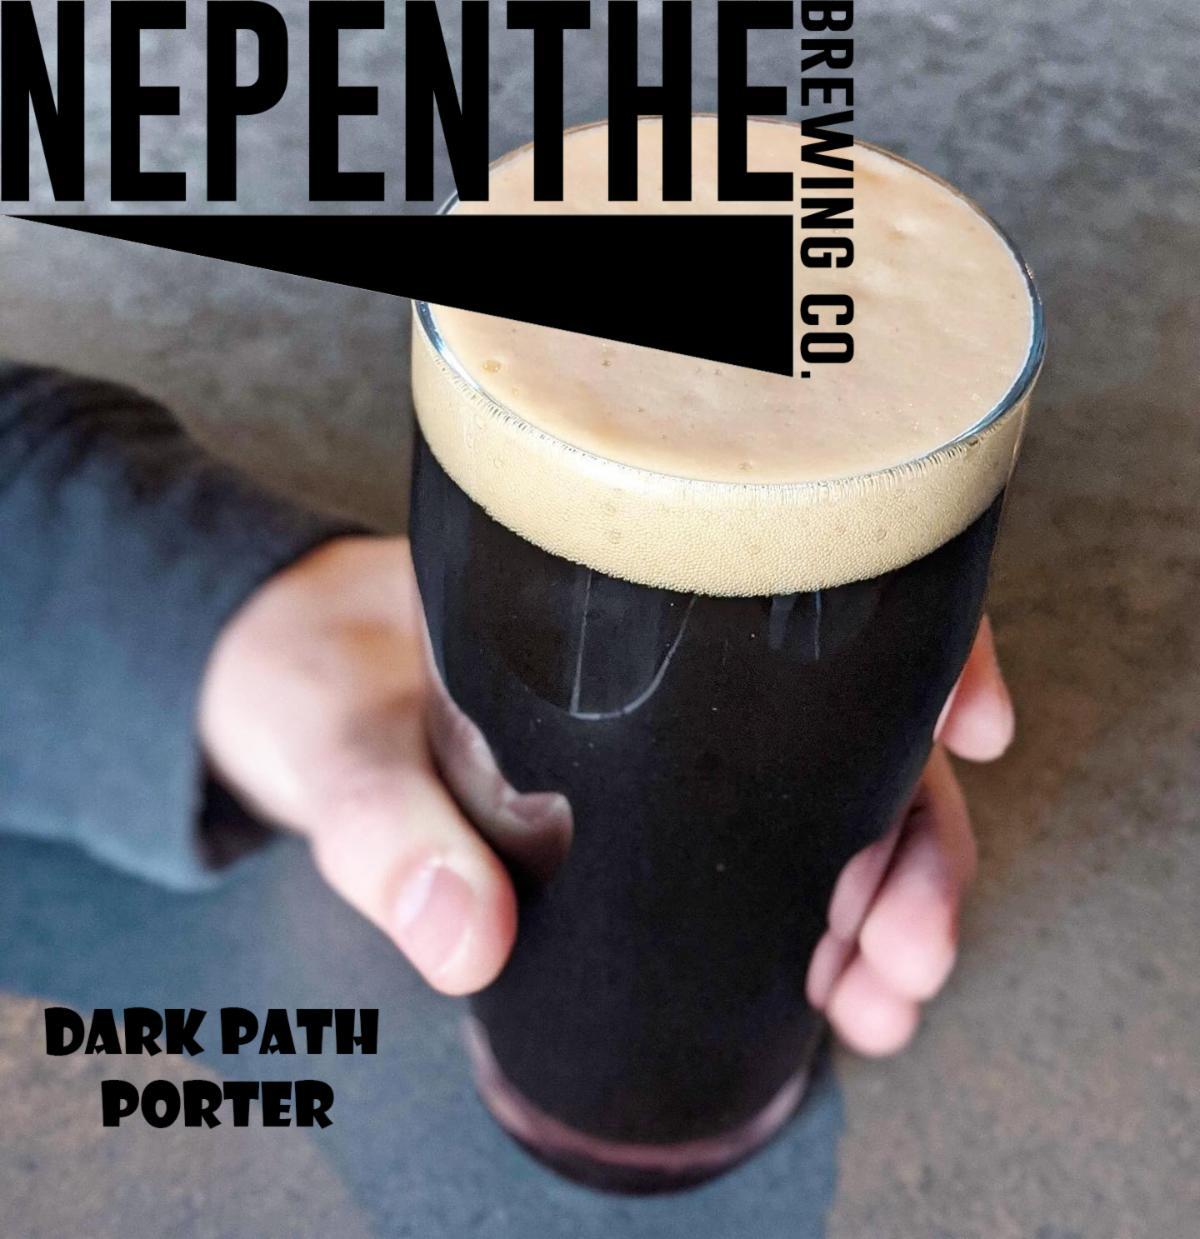 nepenthe dark path porter.jpg